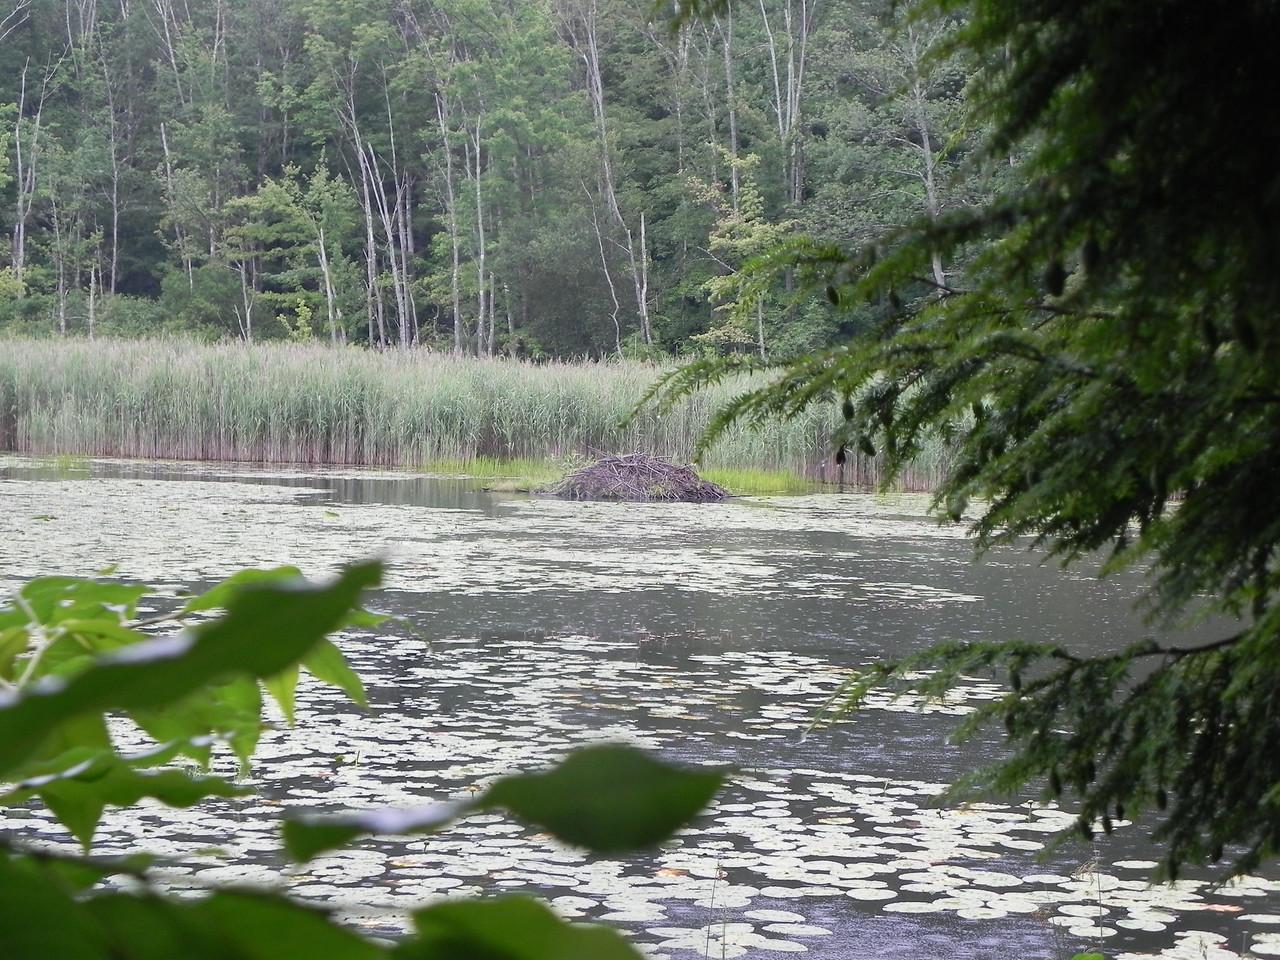 Beaver Lodge. Pleasant Valley Wildlife Sanctuary, Lenox, MA